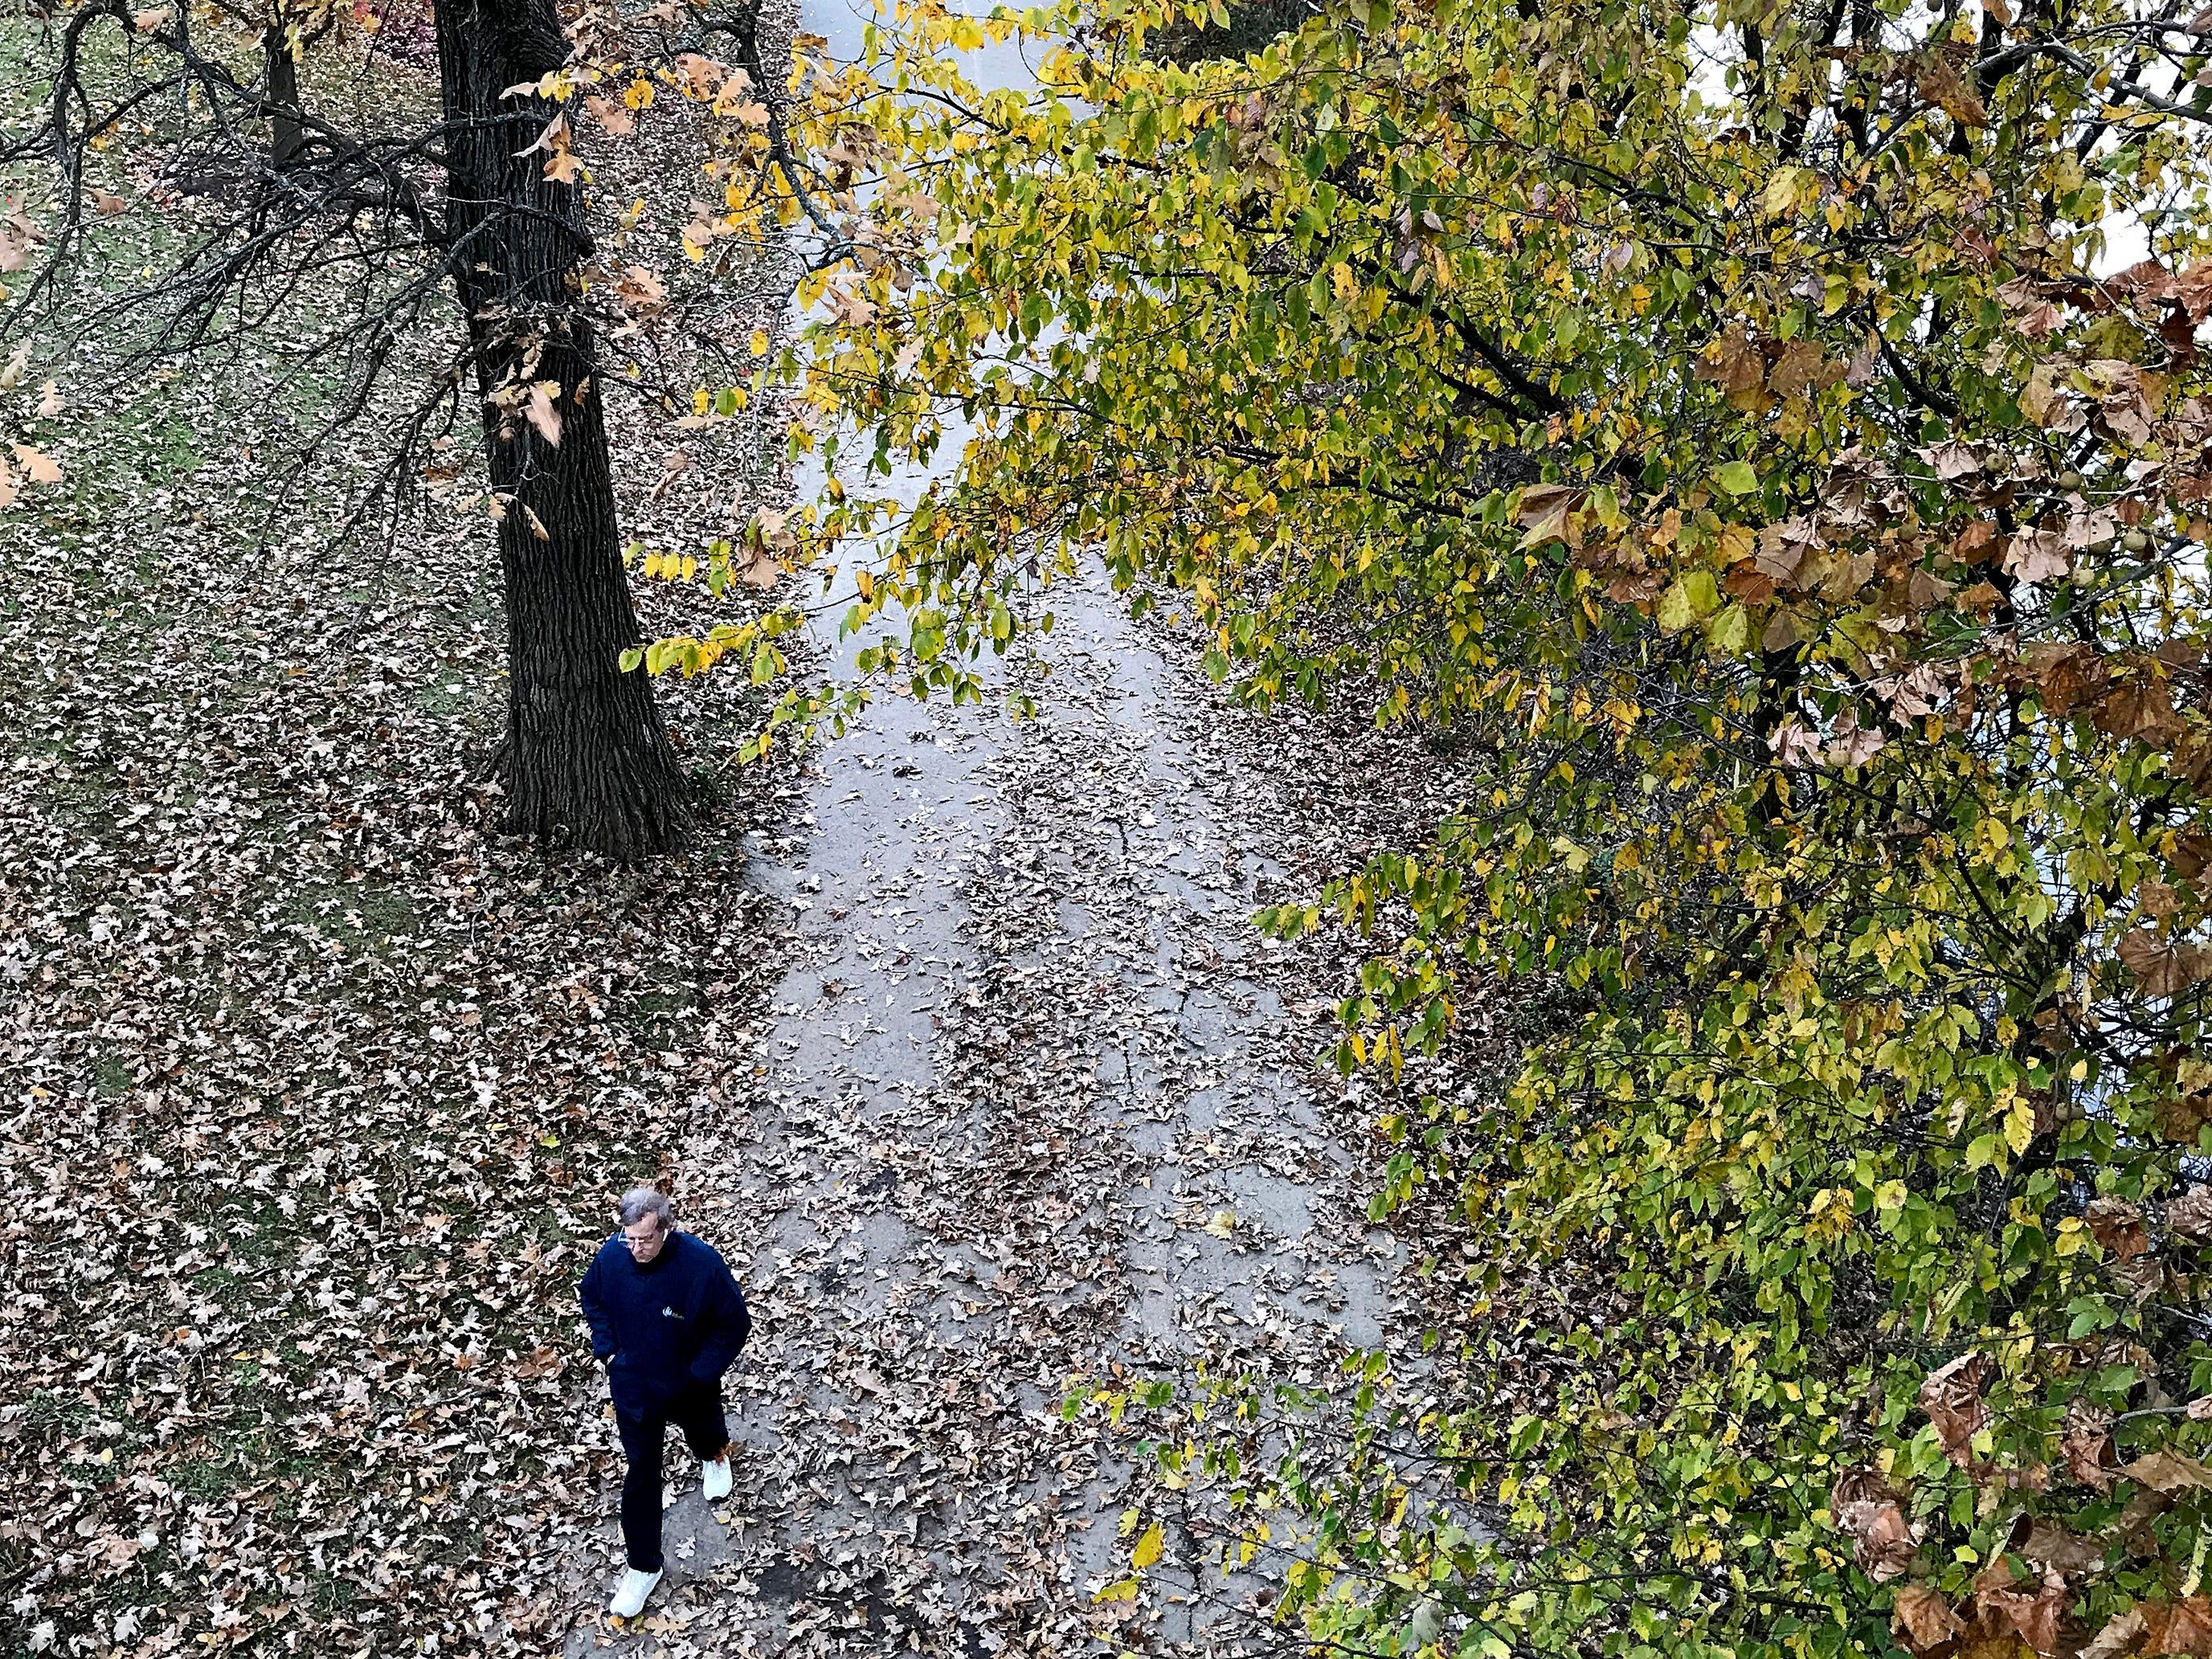 A man walks along fallen leaves at Winton Woods Park Sunday, November 4, 2018.